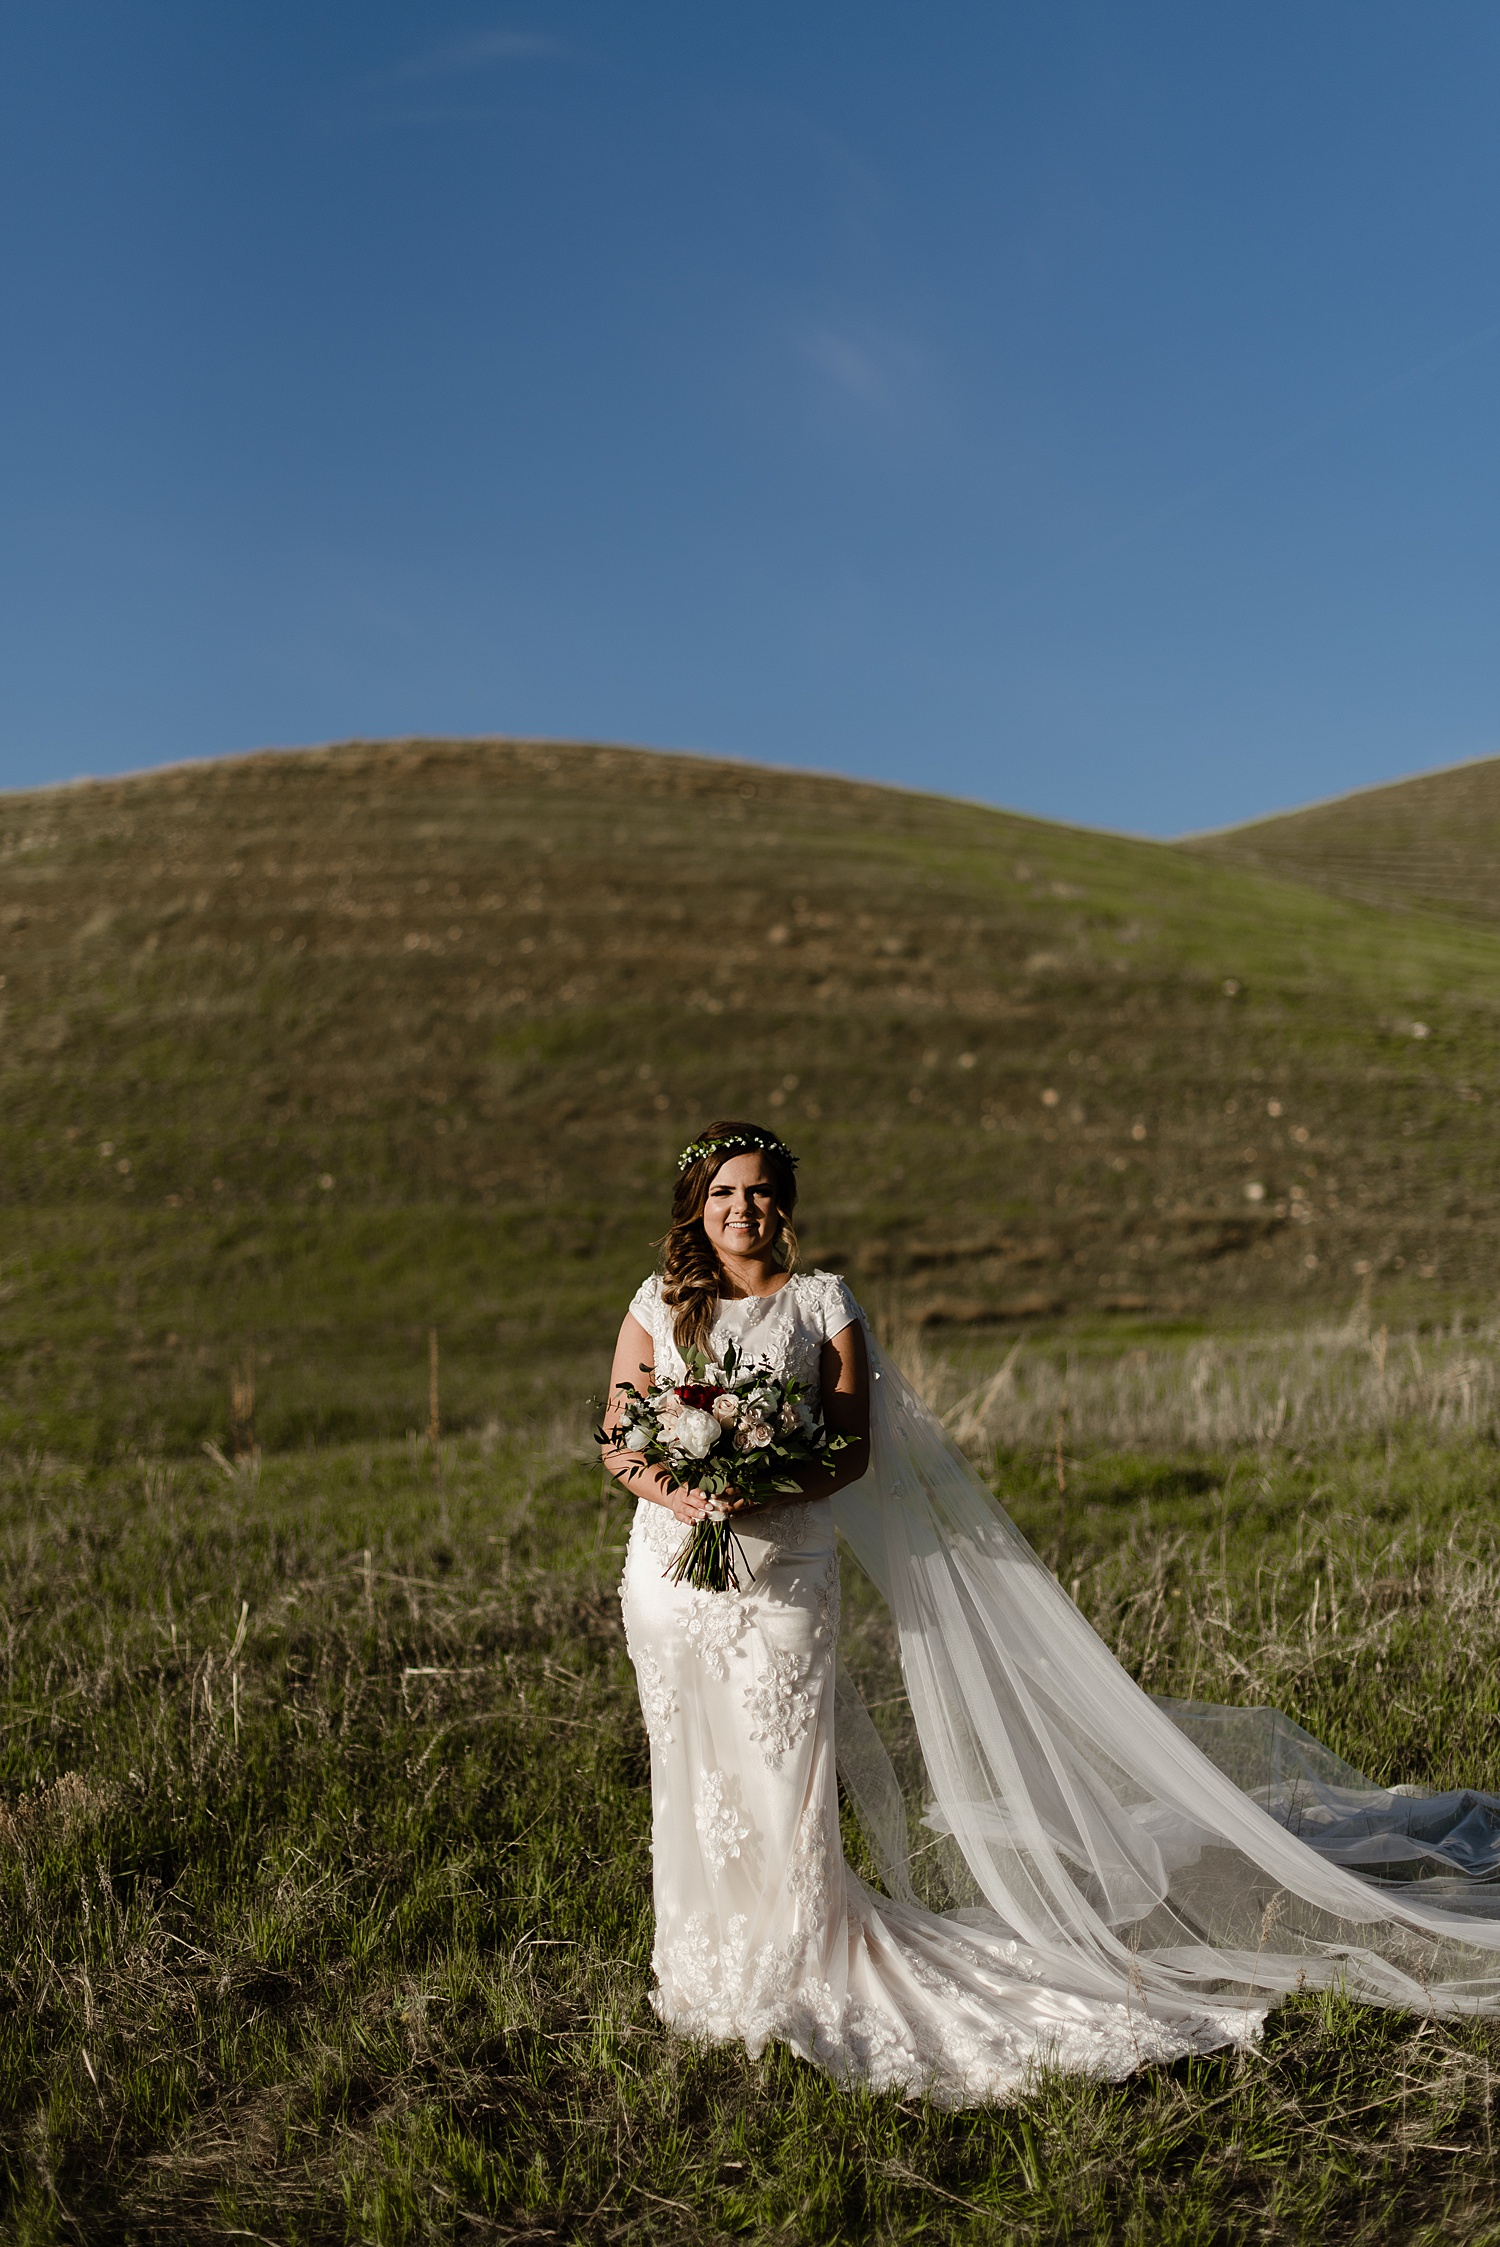 Zandra Barriga Photo - Dallas + Megan Green Hills Bridals_0007.jpg